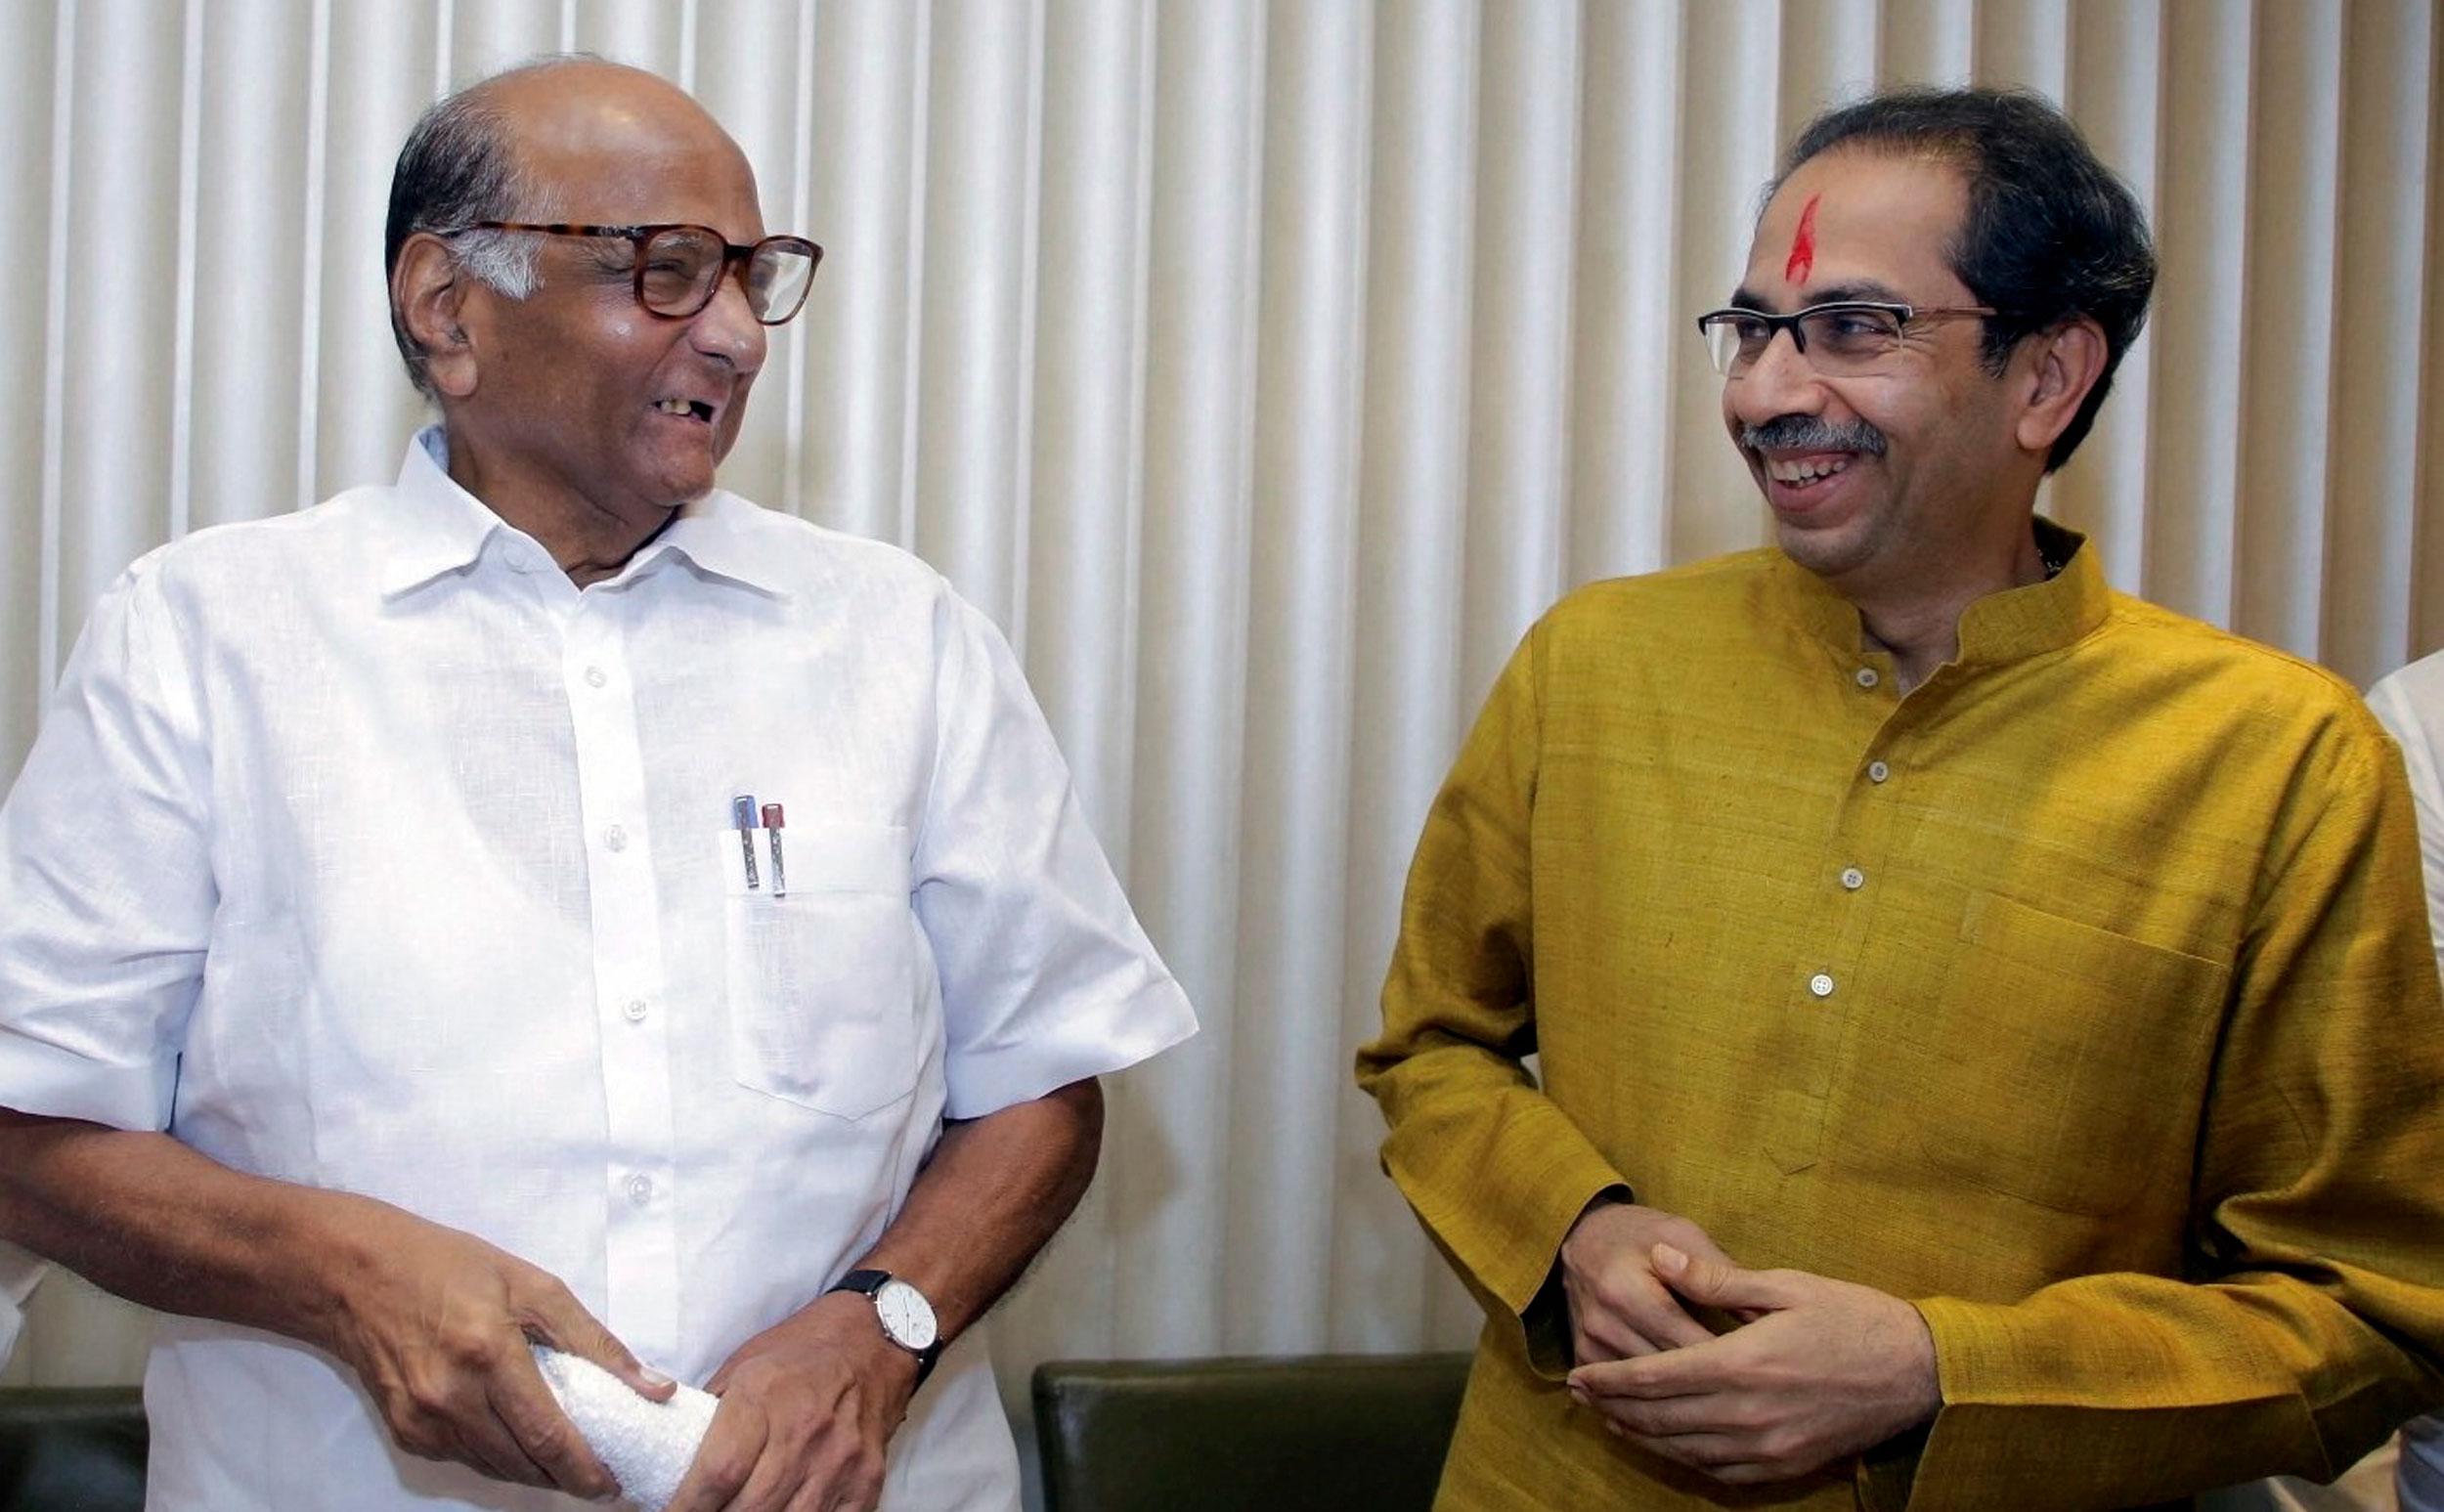 The Maharashtra story may not be over yet